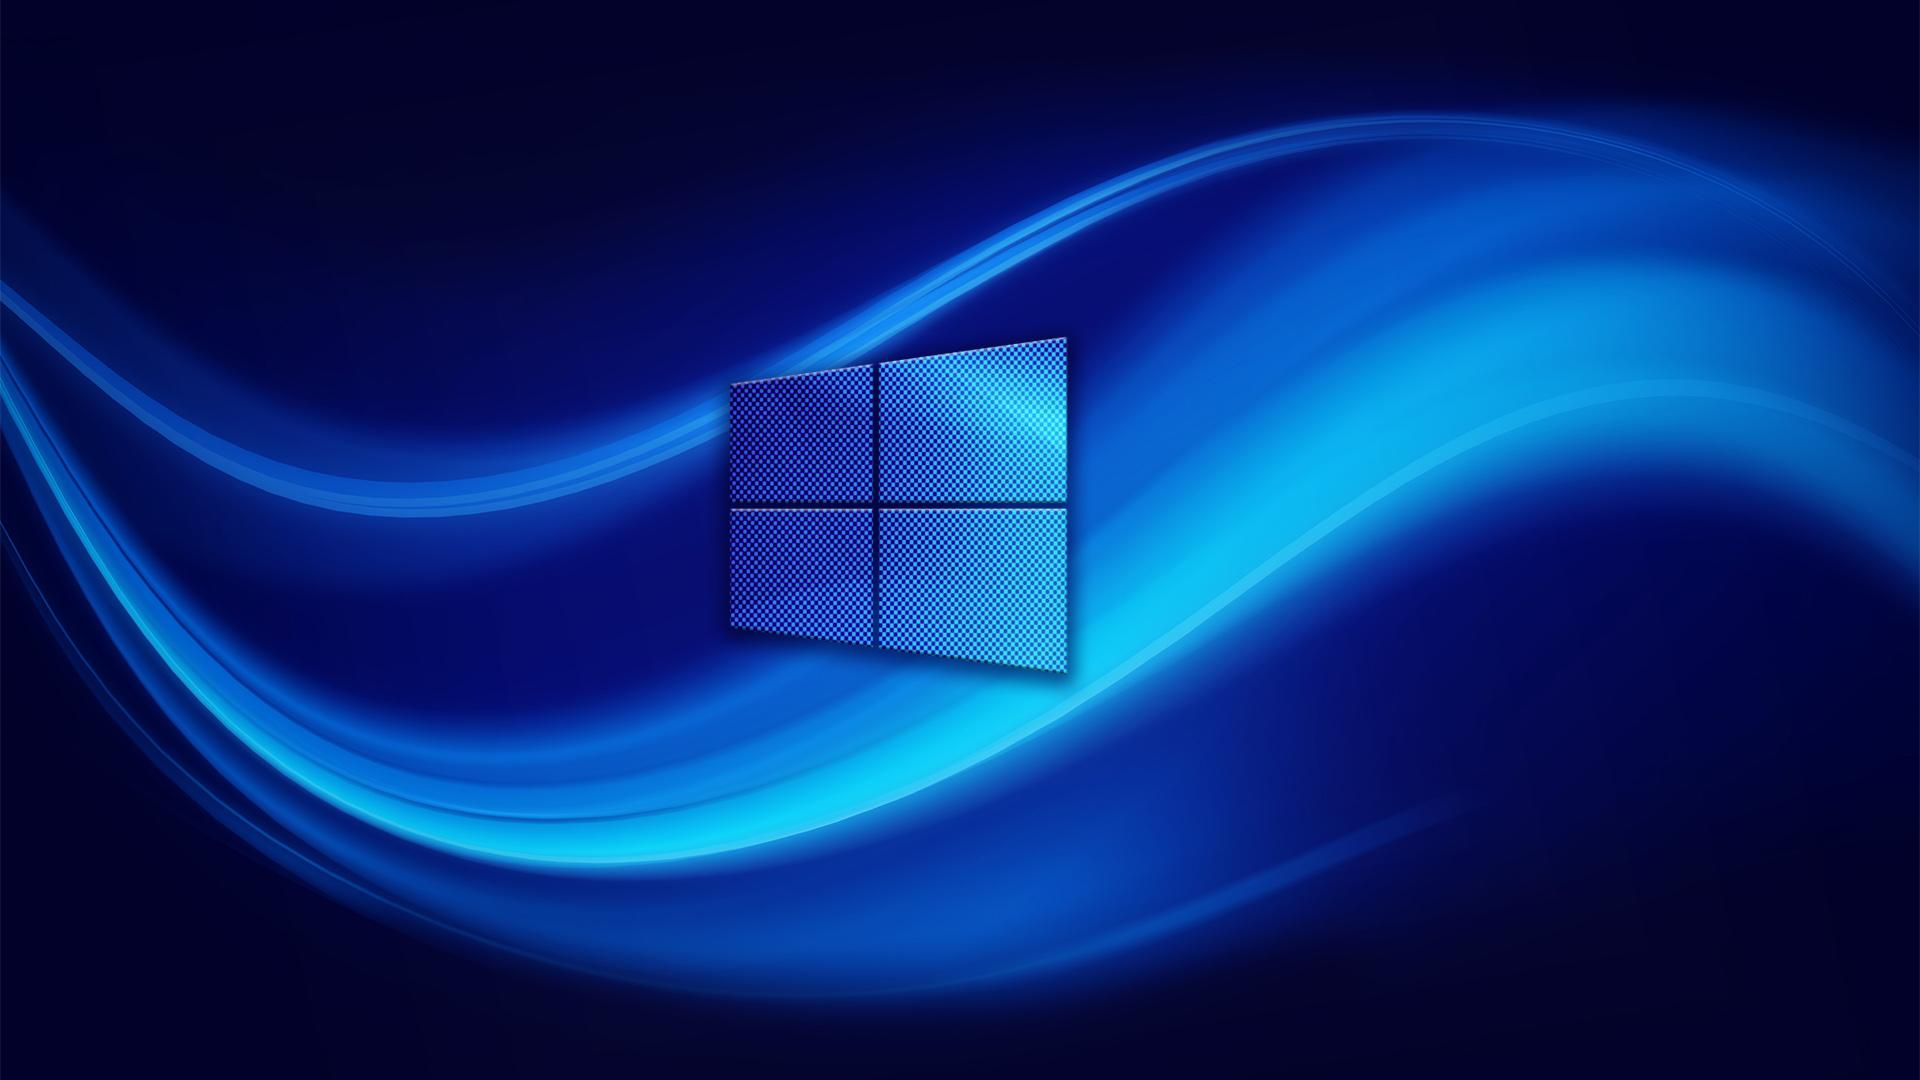 ten wave windows 10 wallpaper windows 10 logo hd